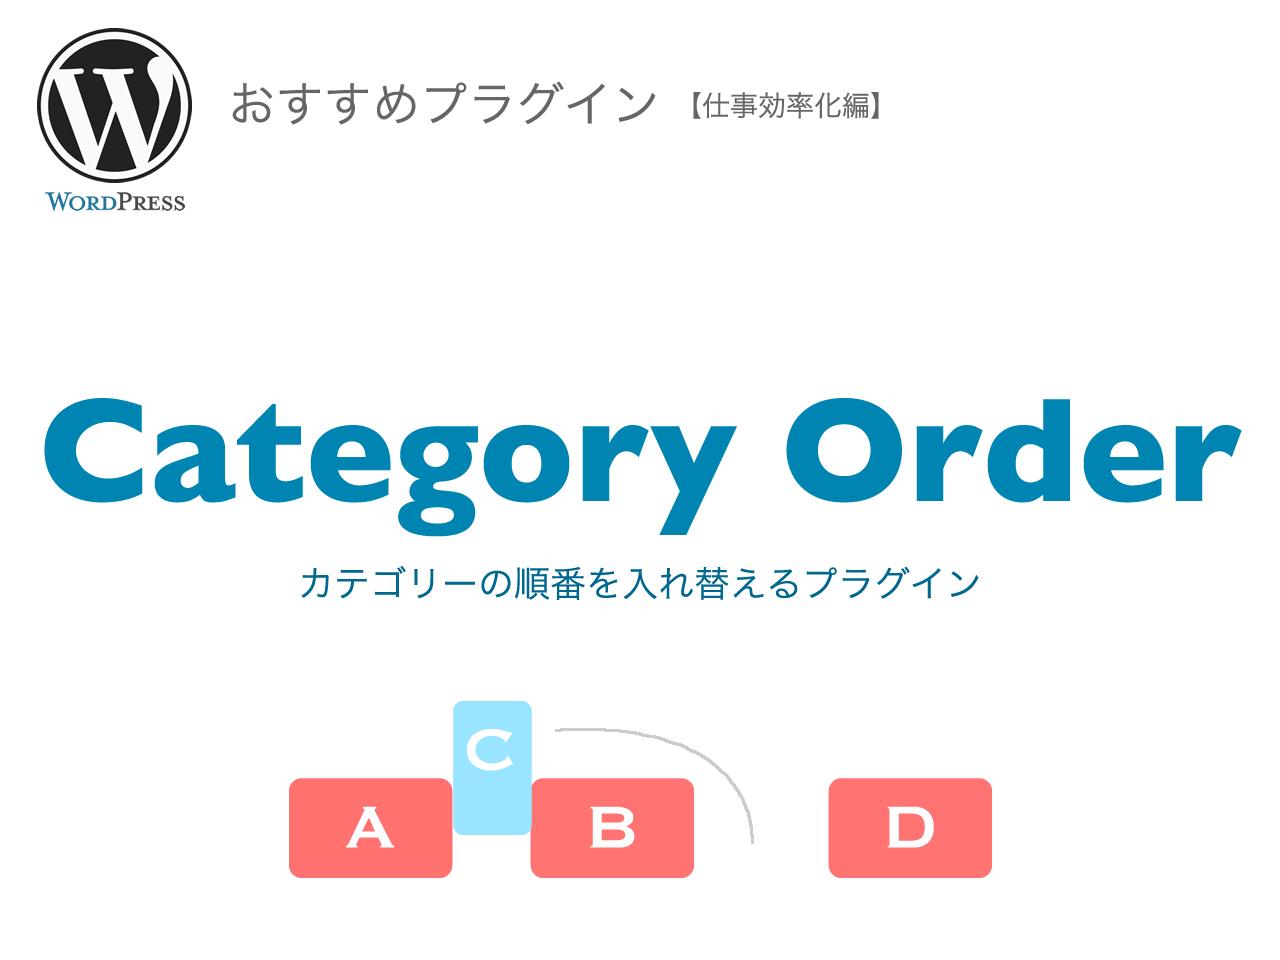 【WordPress】カテゴリーの順番を入れ替える定番プラグイン Category Order